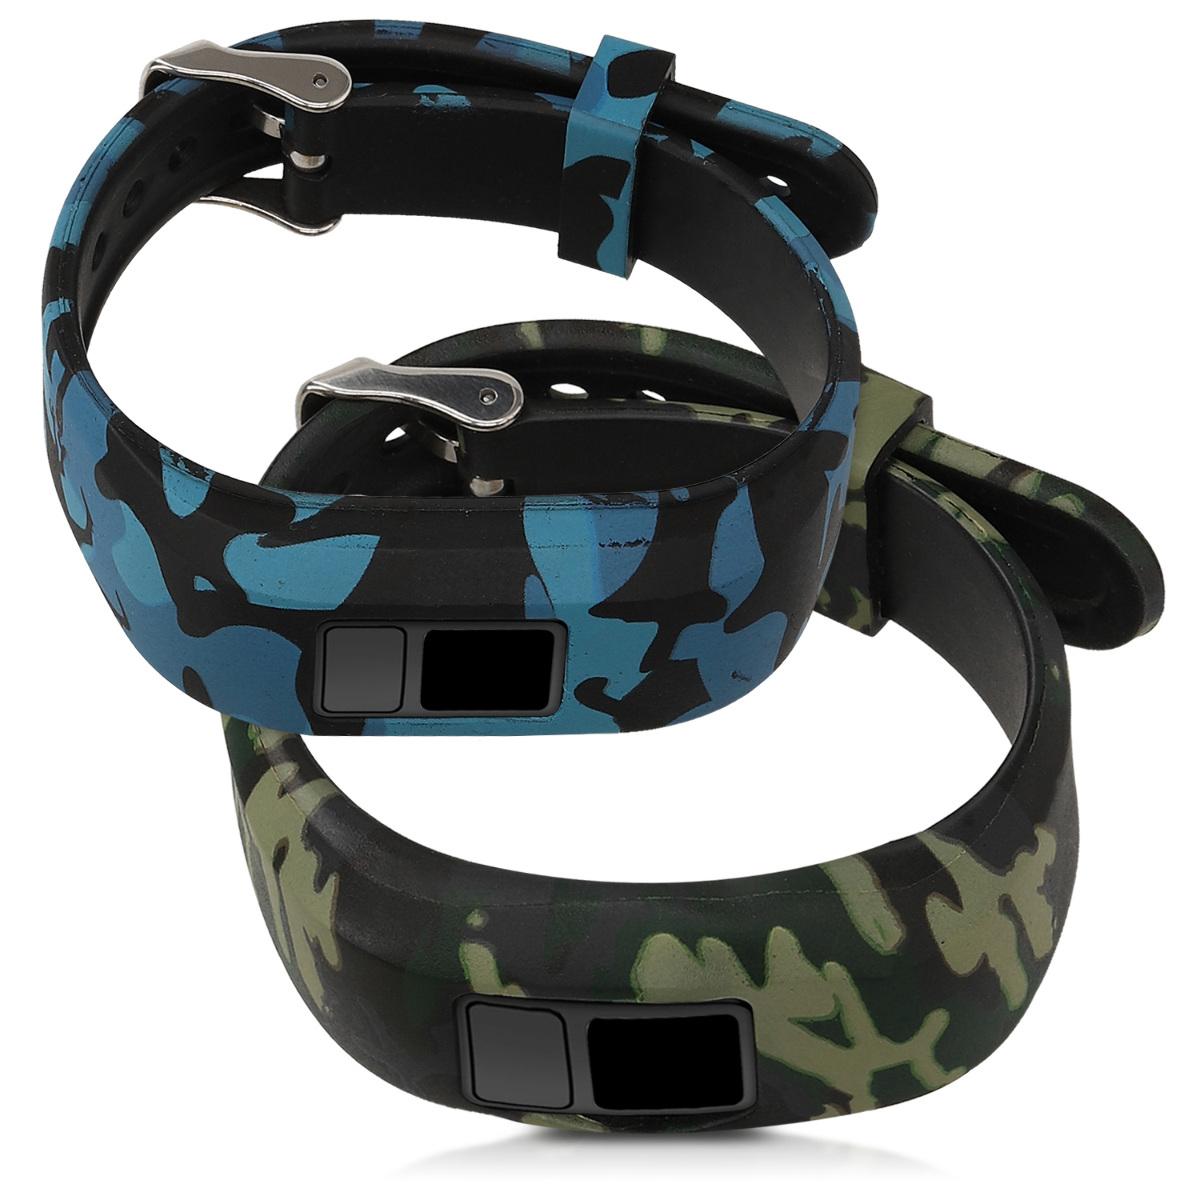 2x Sportarmband für Garmin Vivofit jr 2 Fitnesstracker TPU Smartwatch Band jr